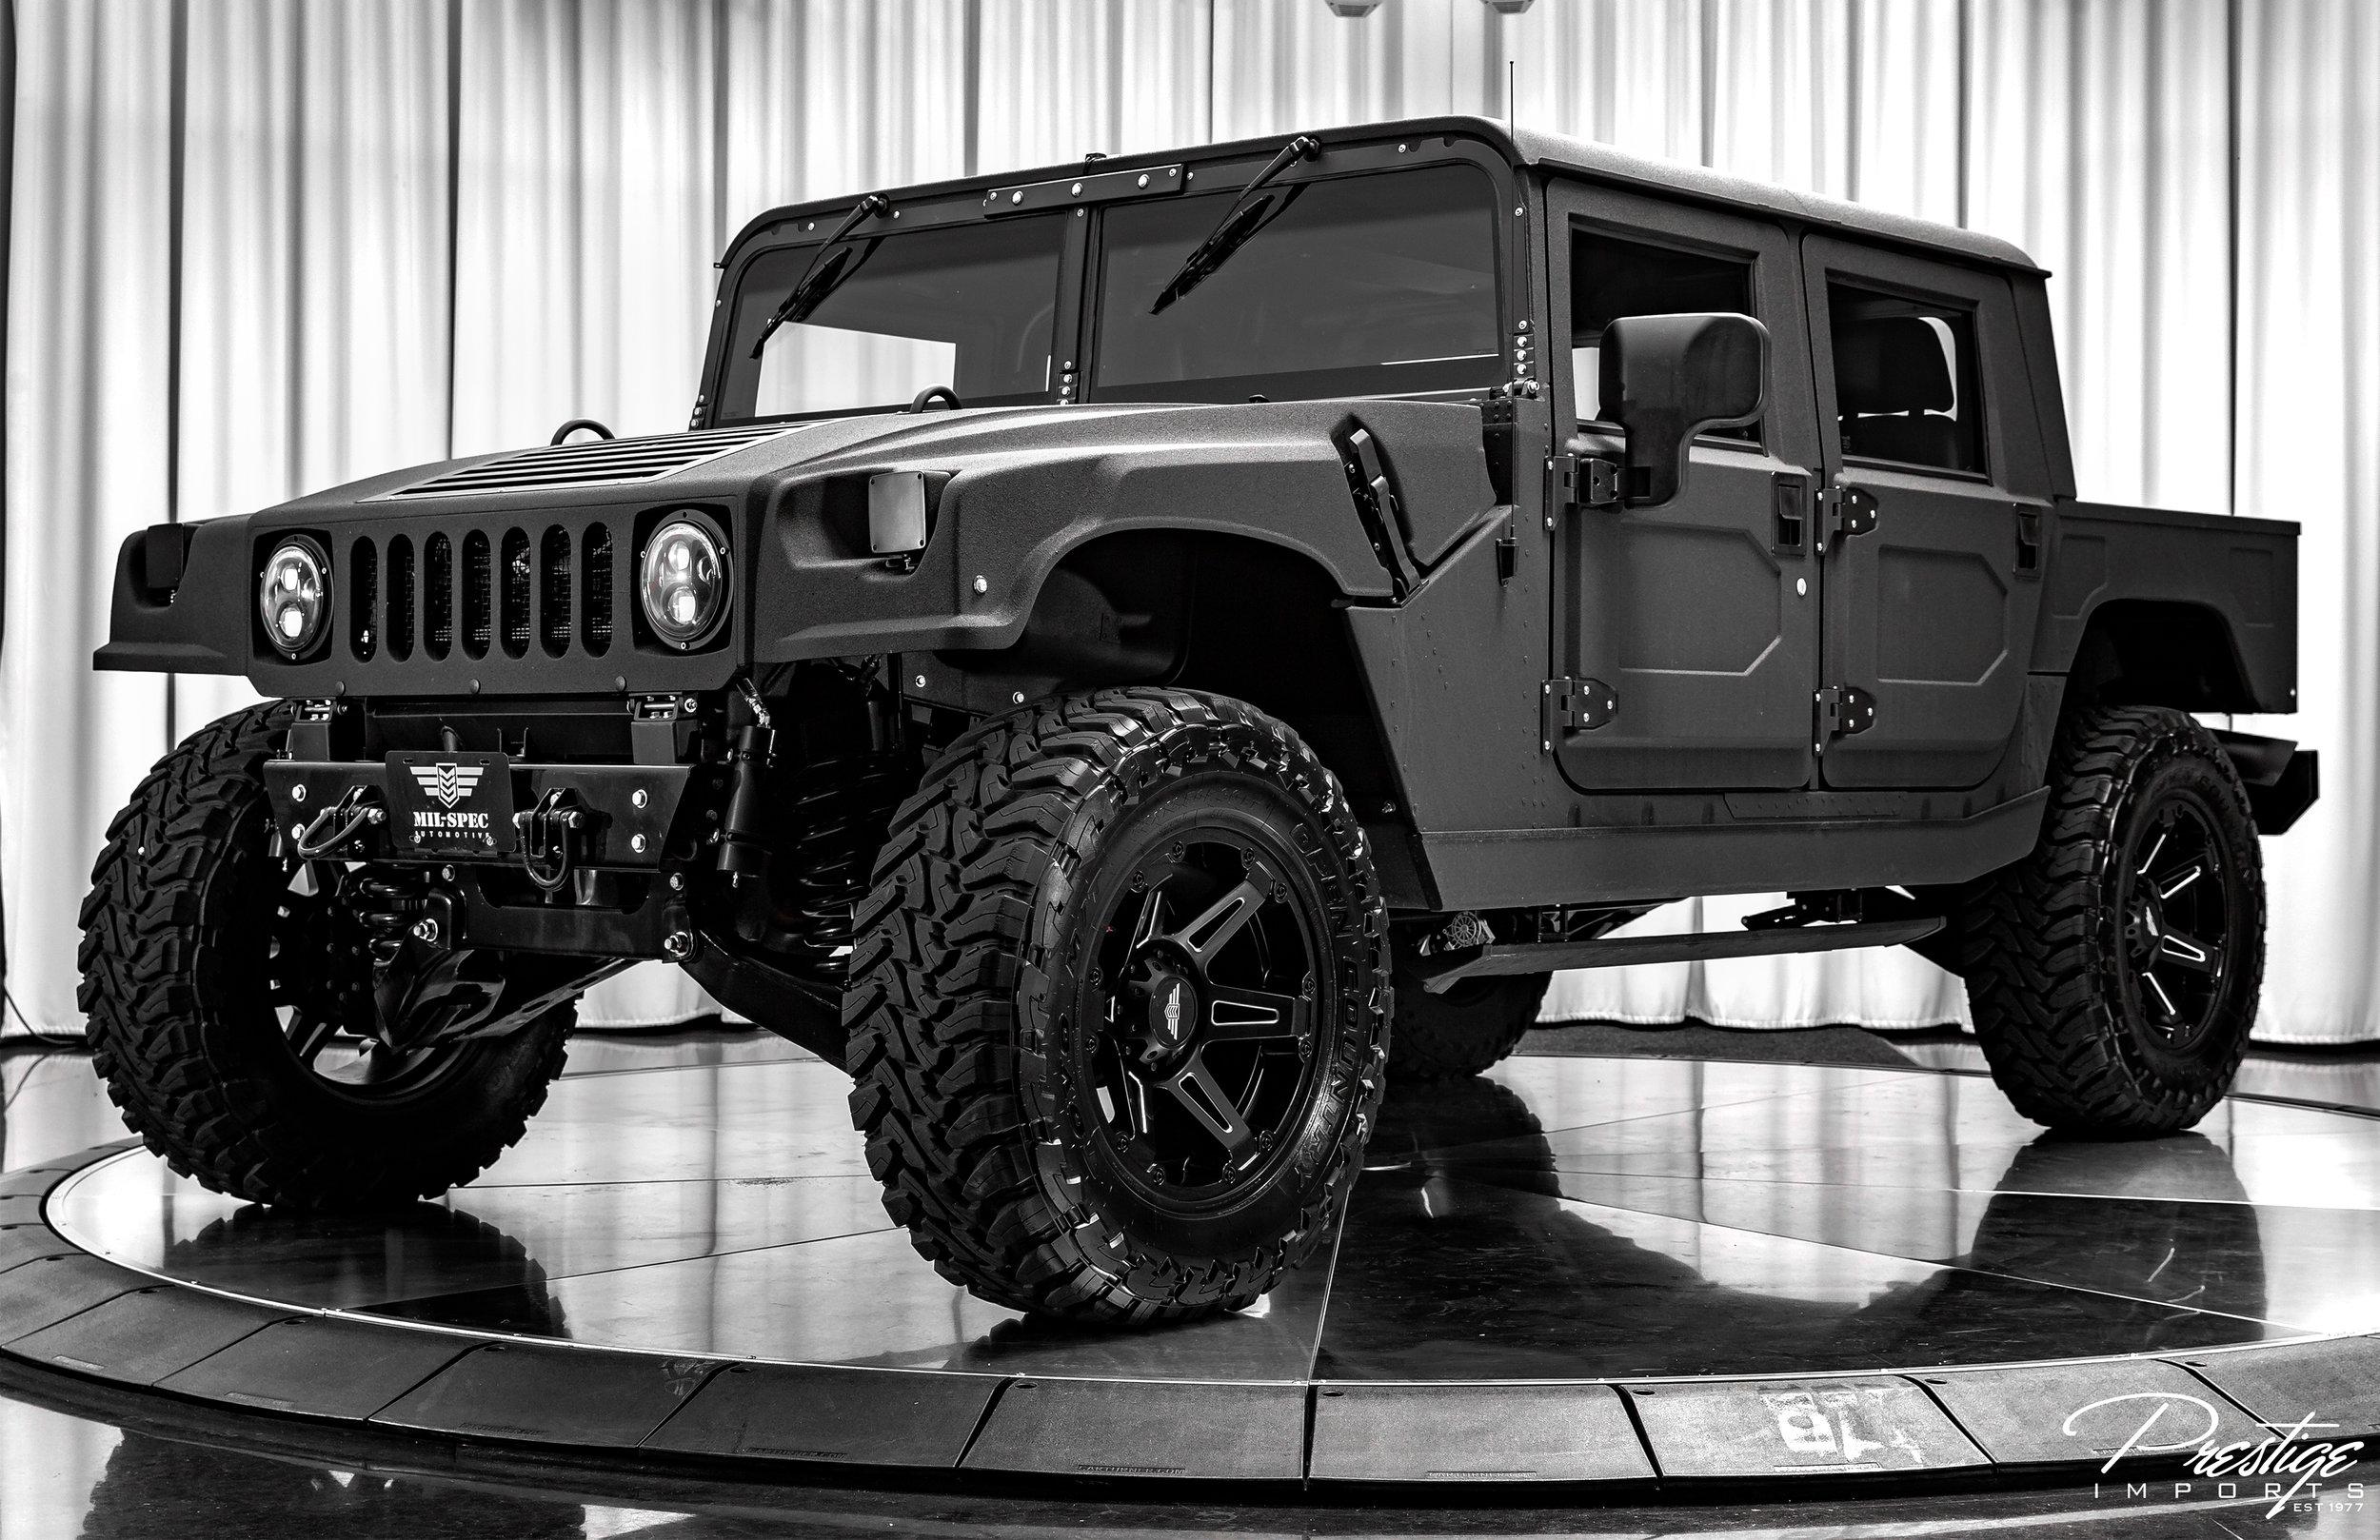 Mil_Spec_Automotive_Hummer_H1_007_Exterior_8.jpg